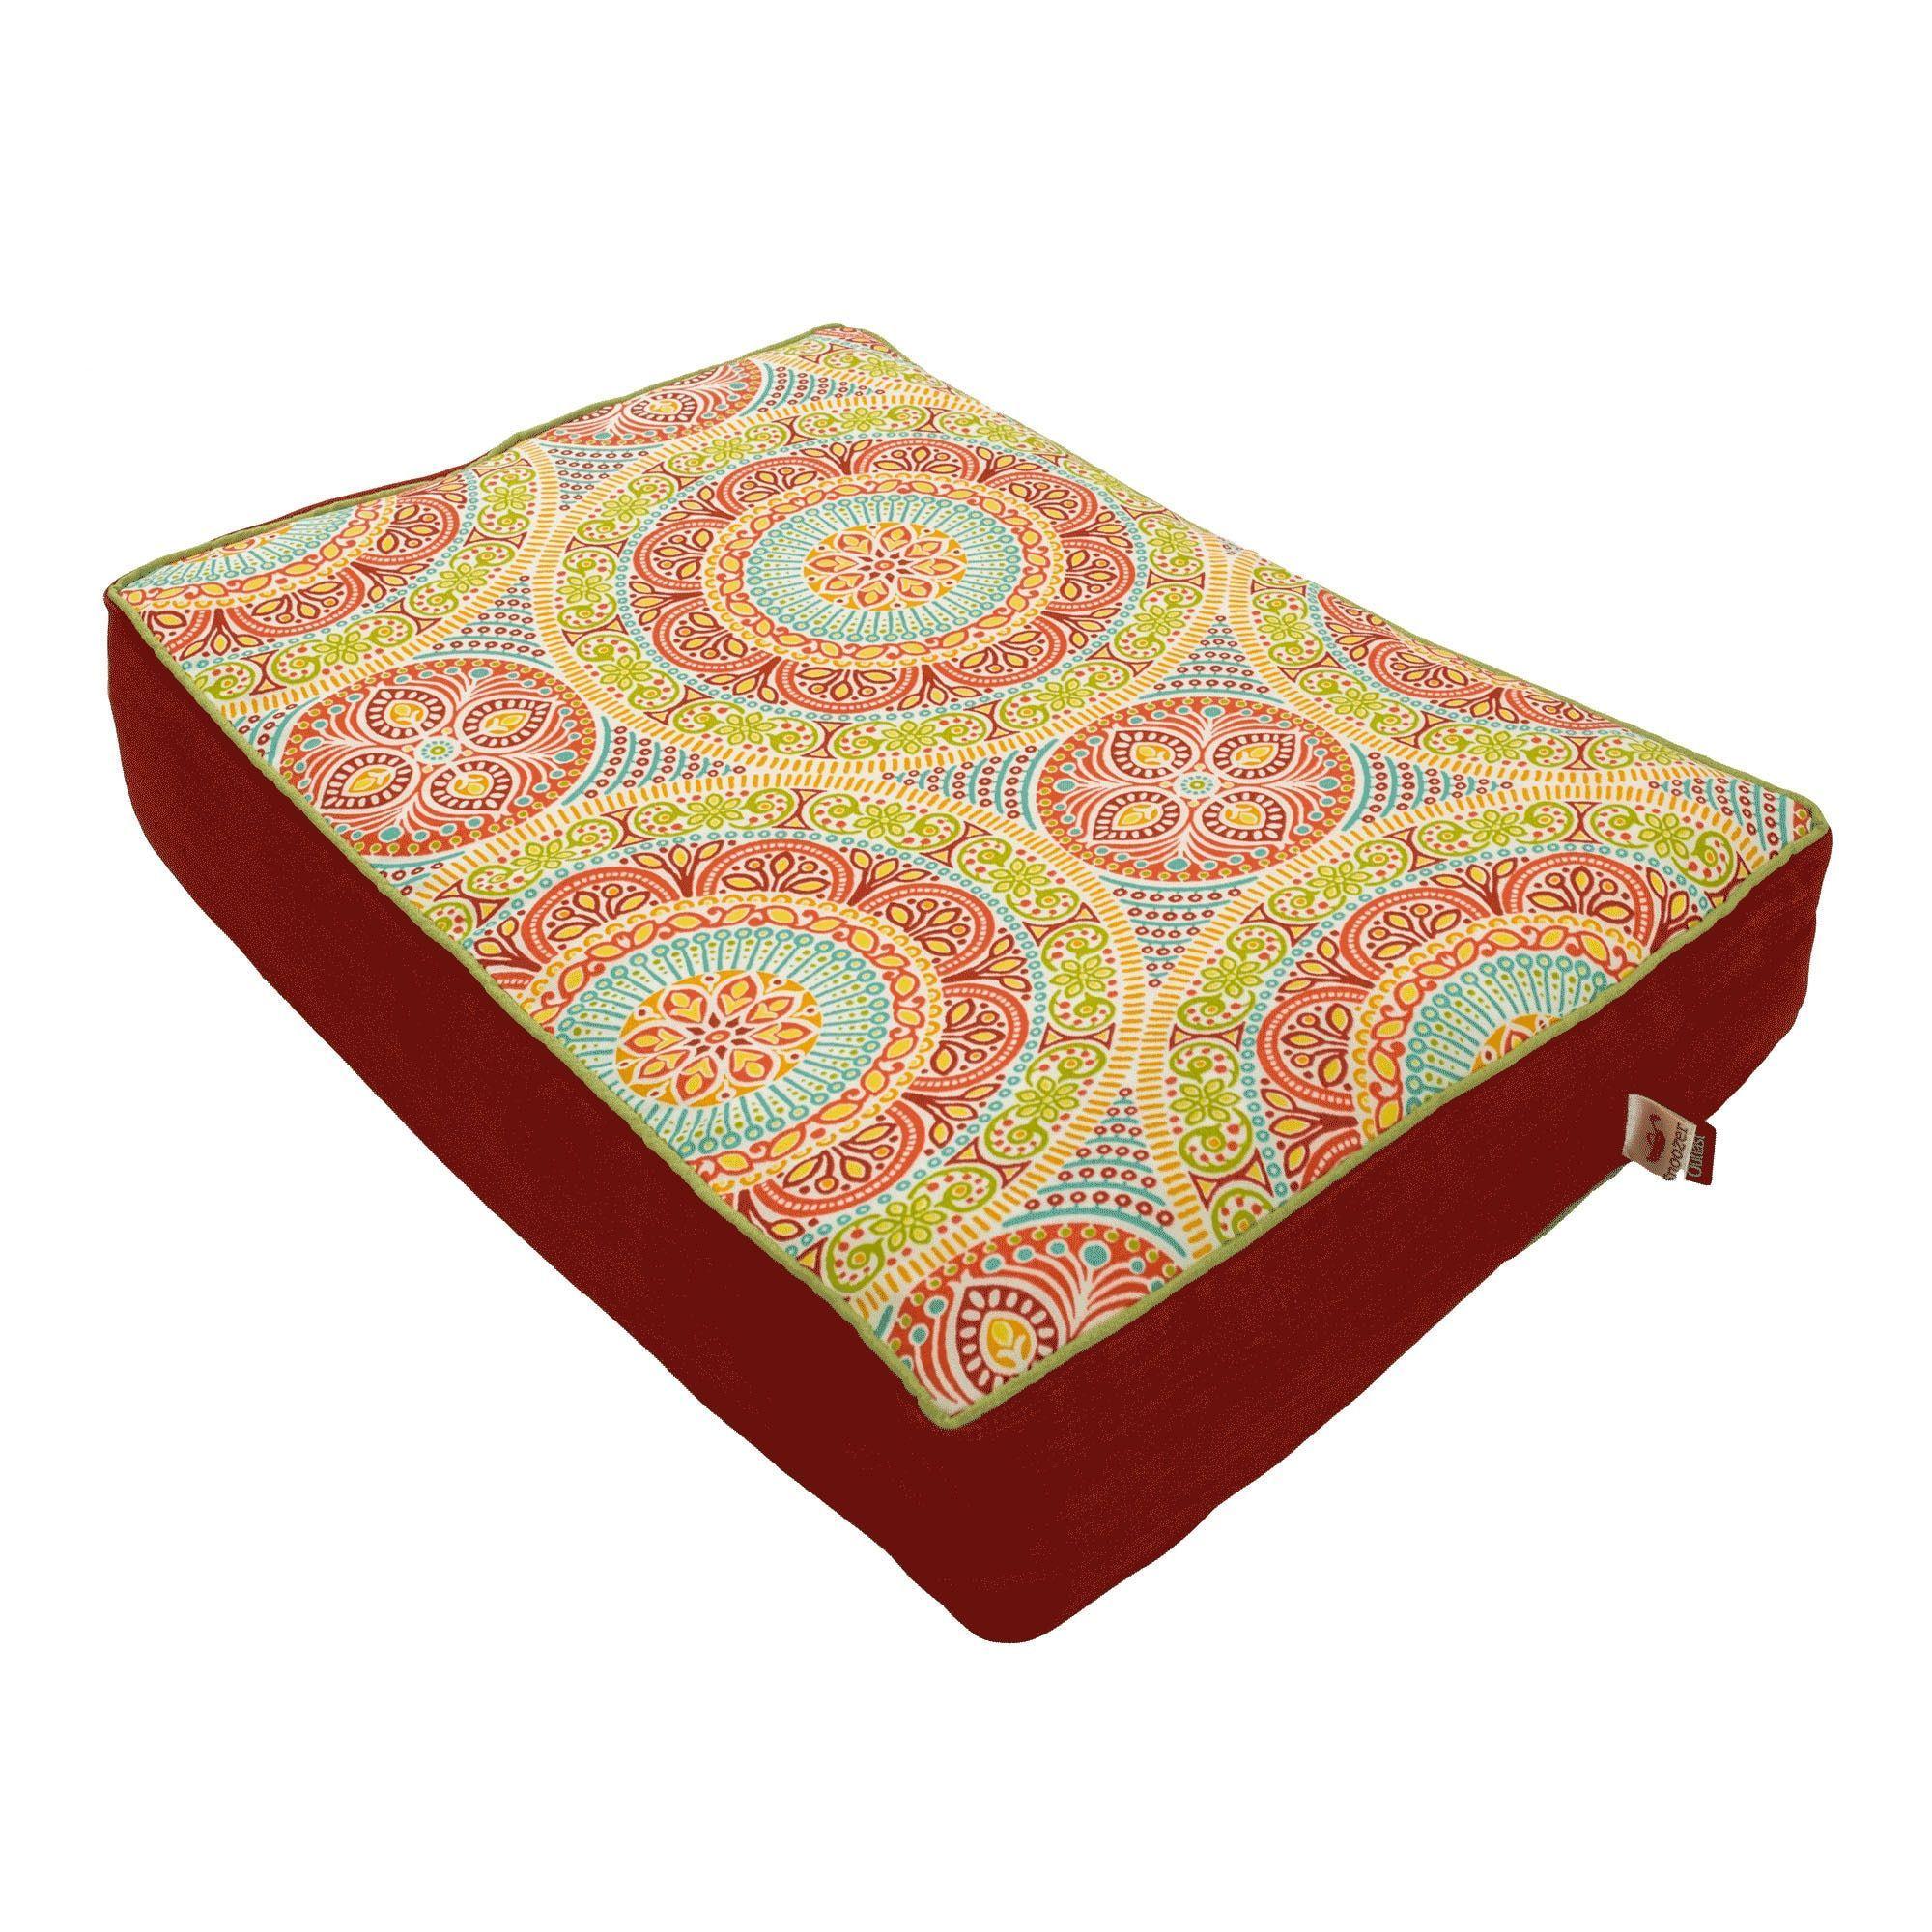 Snoozer Outlast Delancy Heating/Cooling Premium Dog Bed